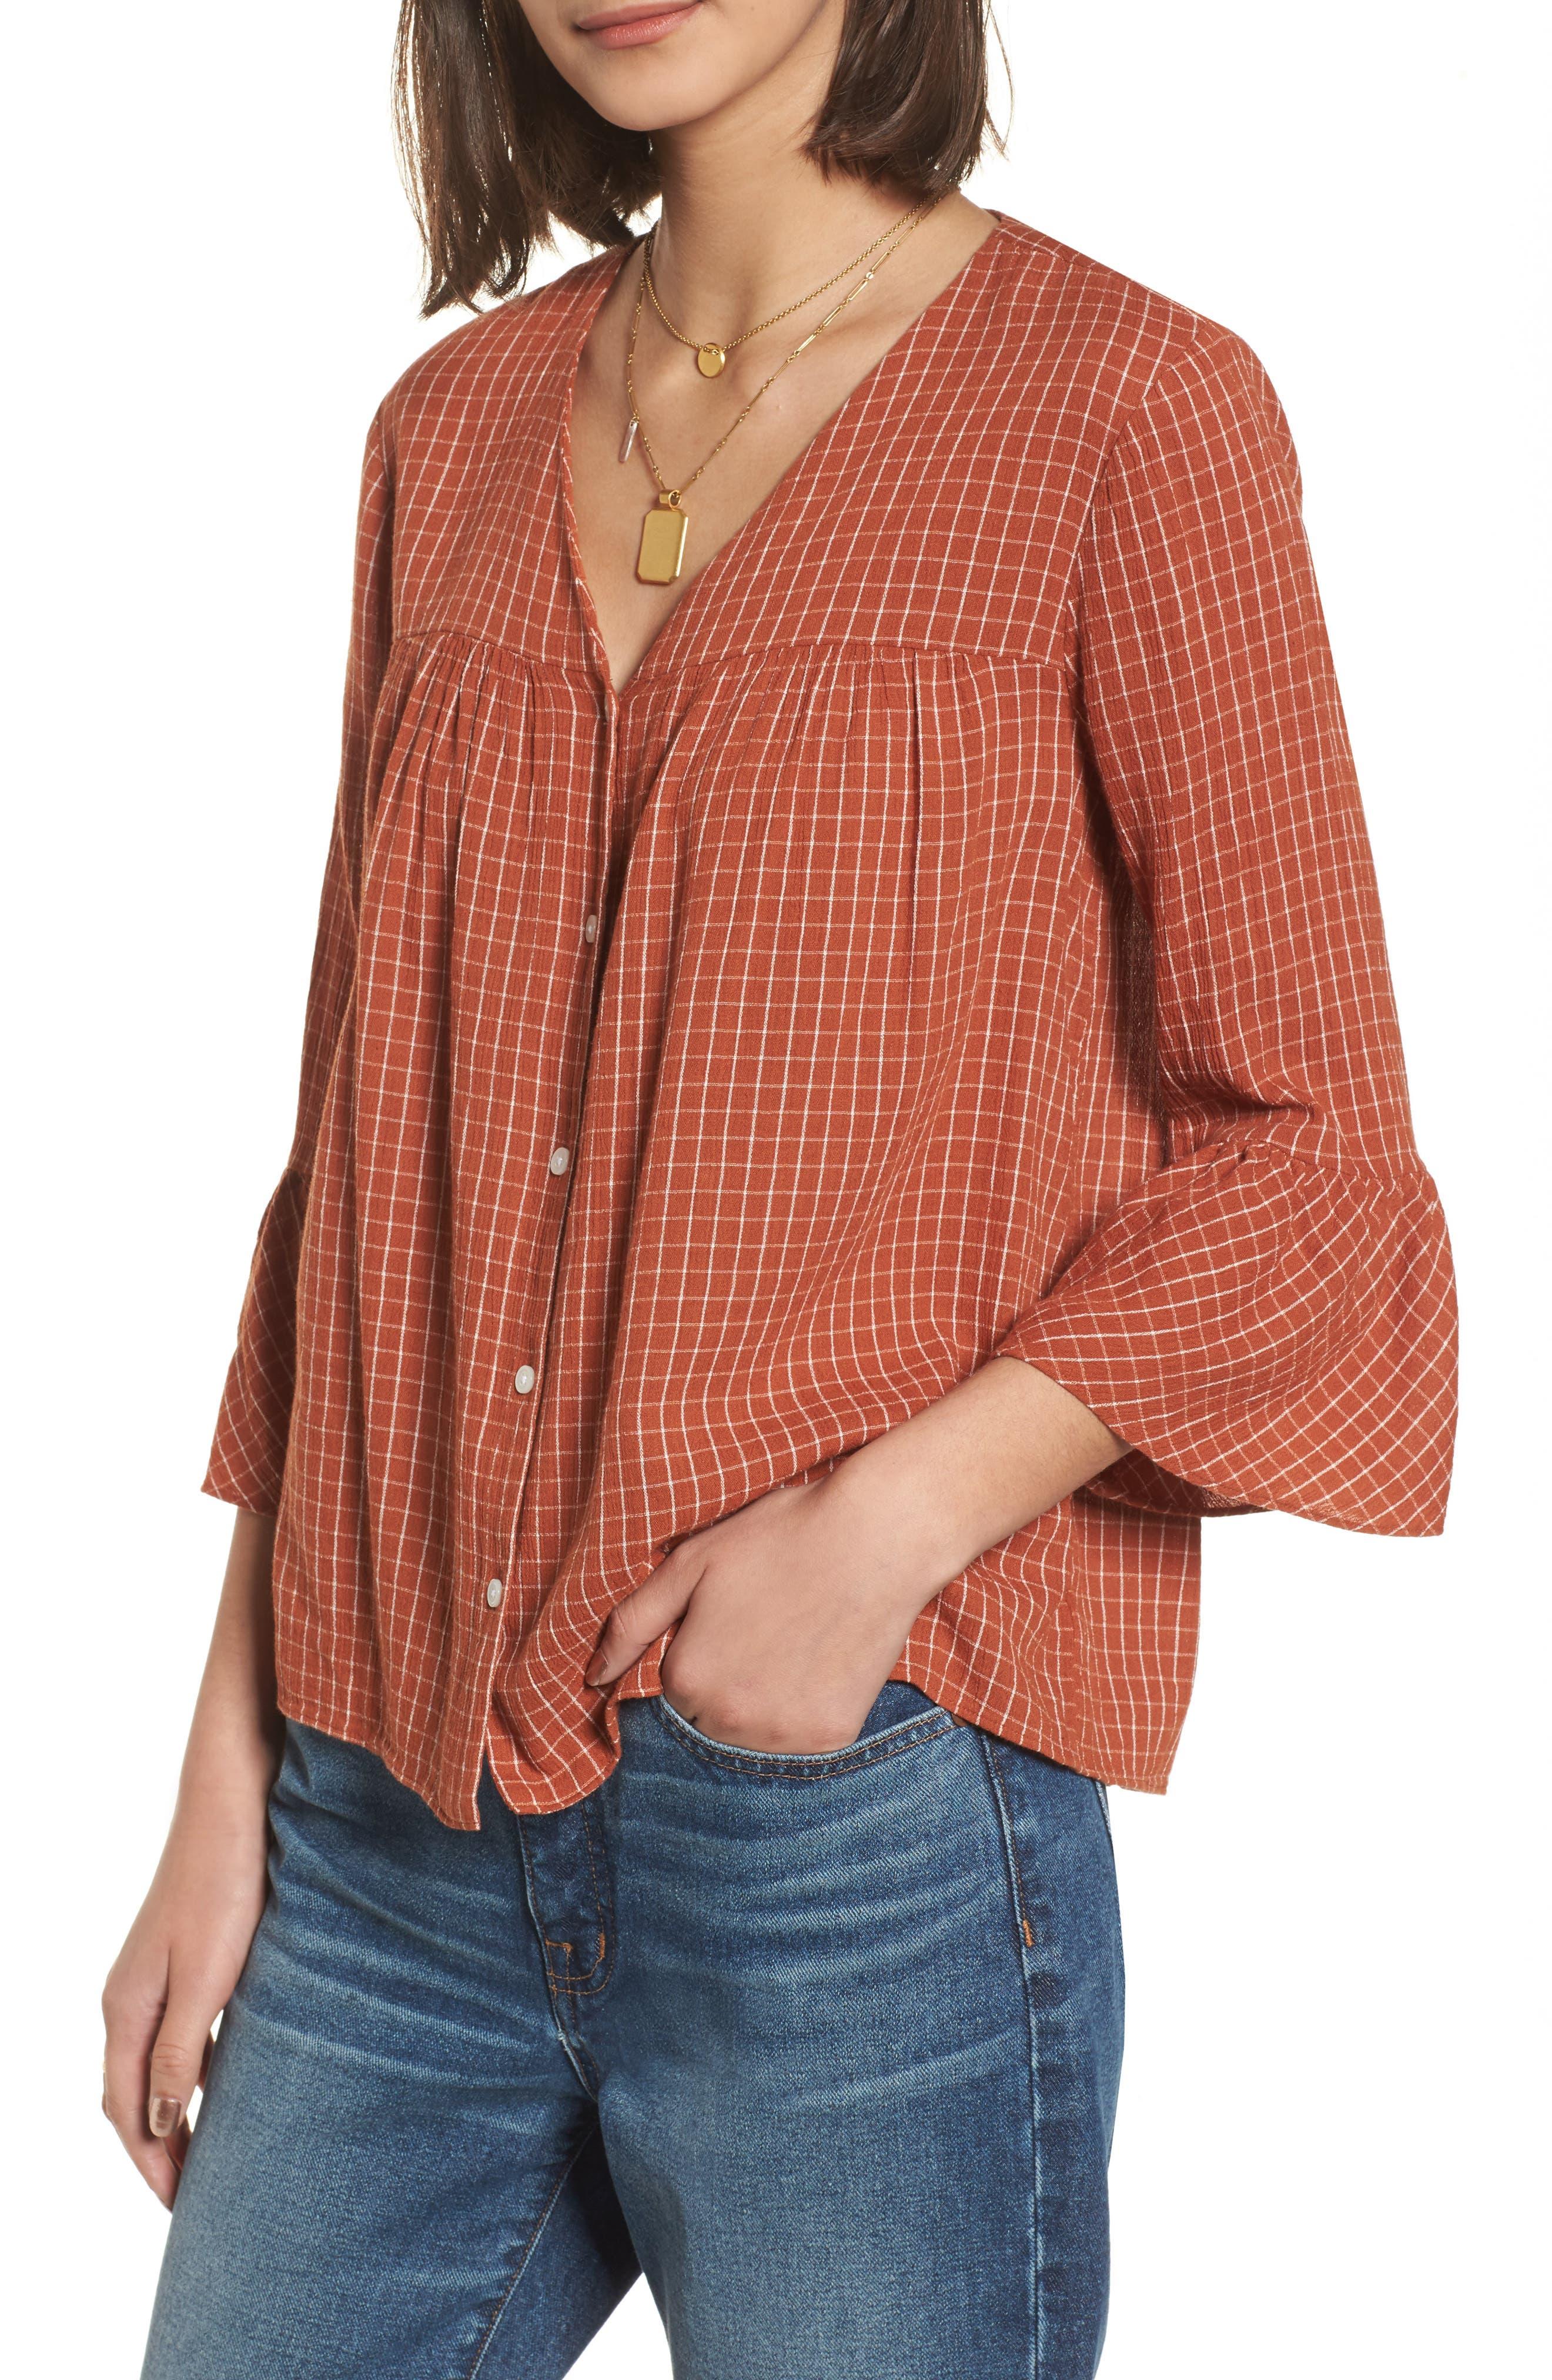 Madewell Veranda Bell Sleeve Shirt